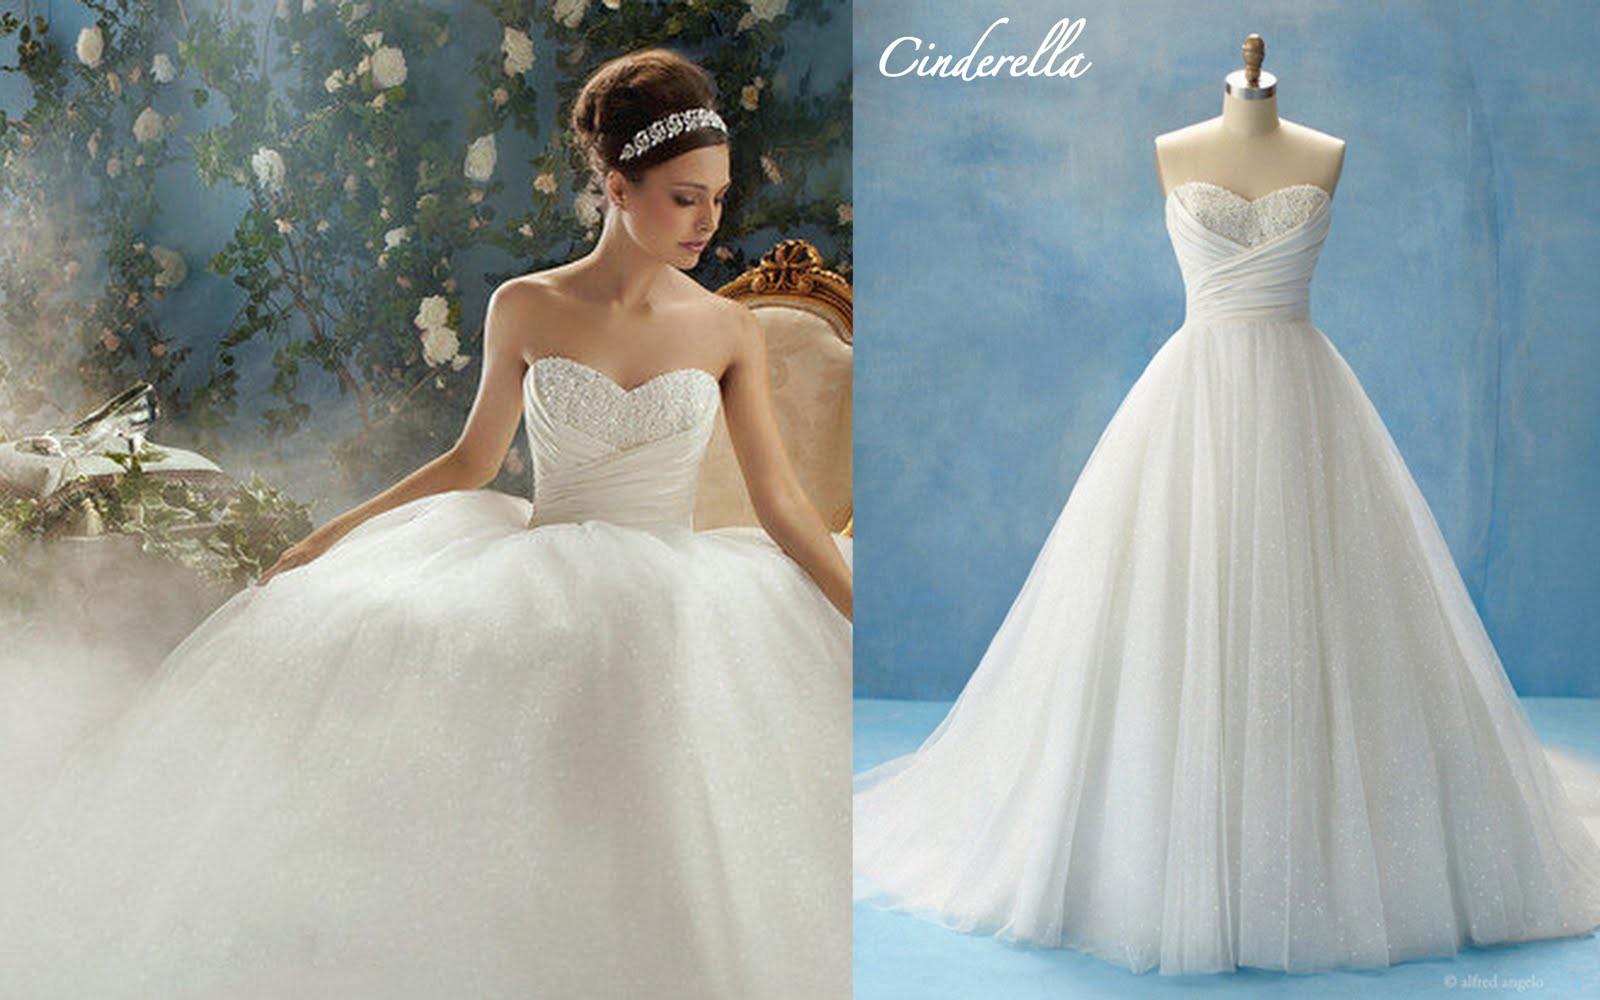 Alfred Angelo Cinderella - Used Wedding Dresses - Stillwhite